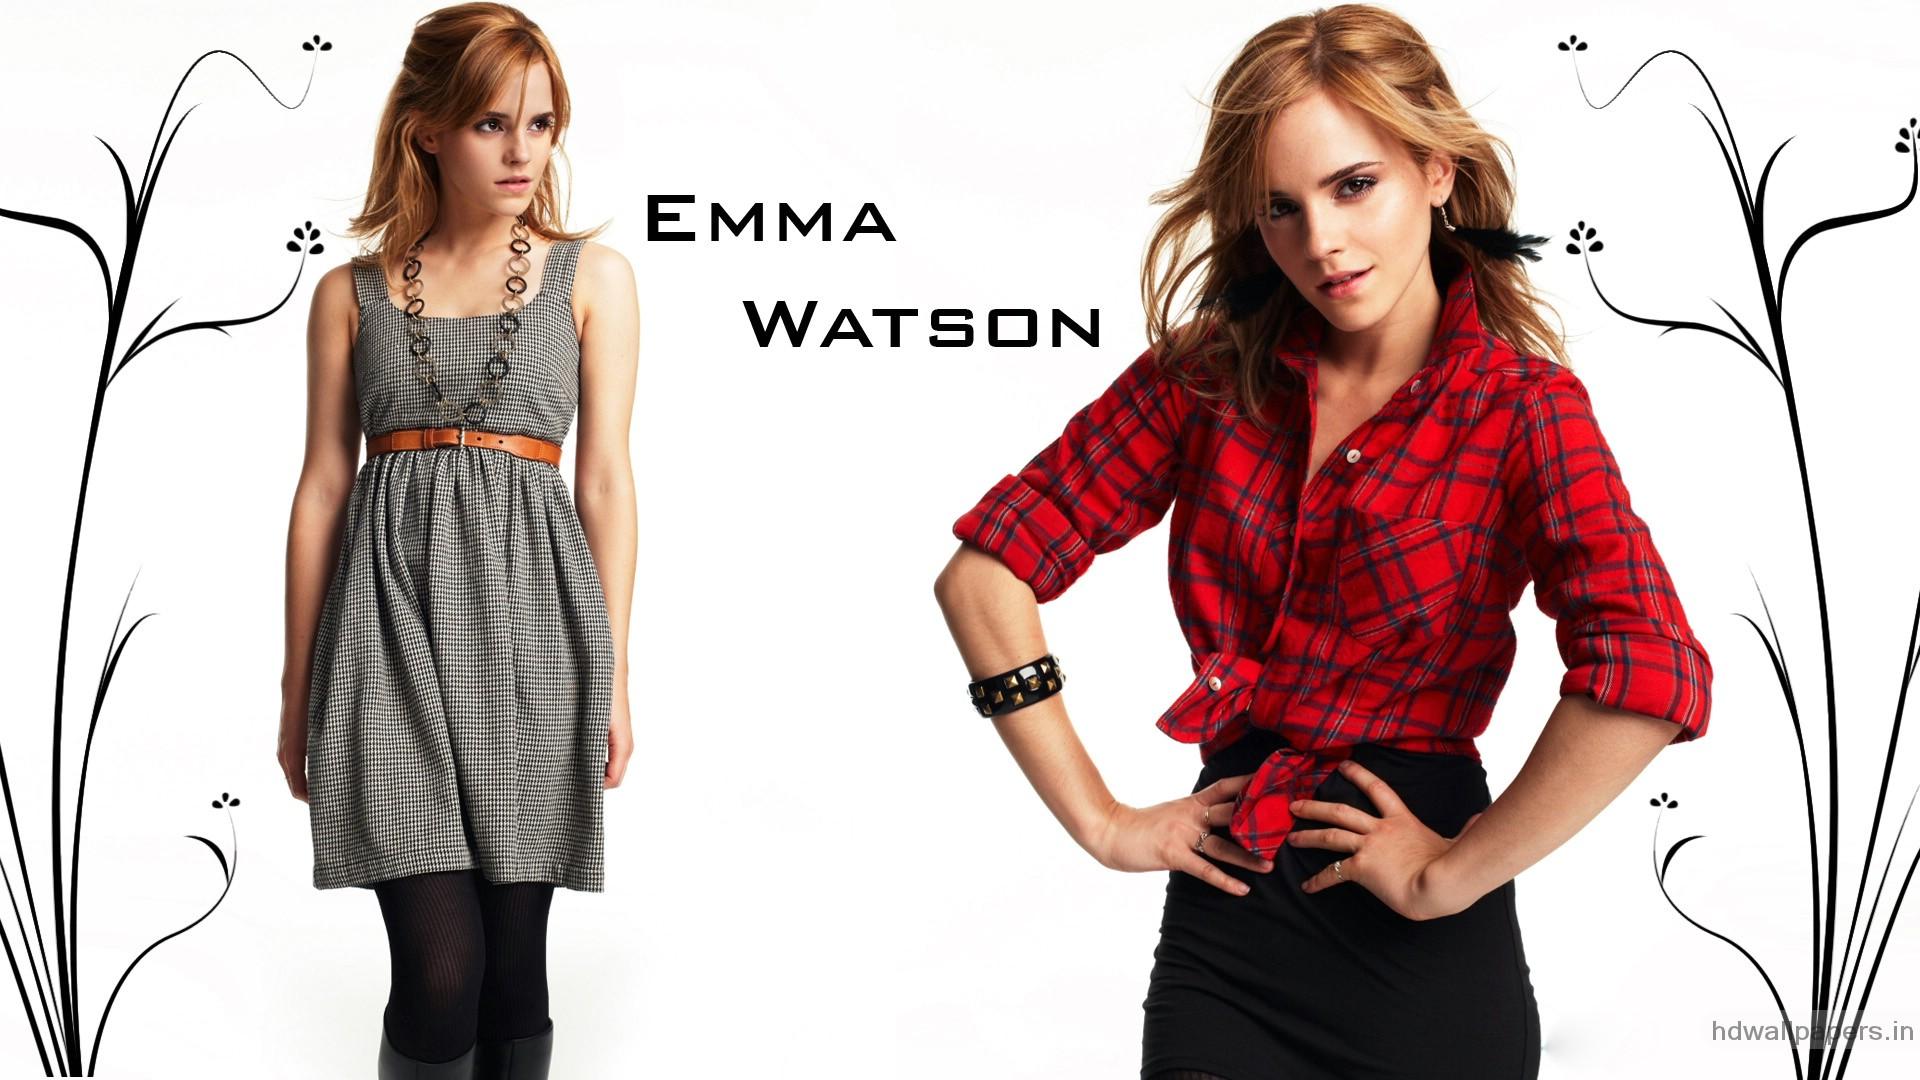 Emma Watson 273 wallpaper